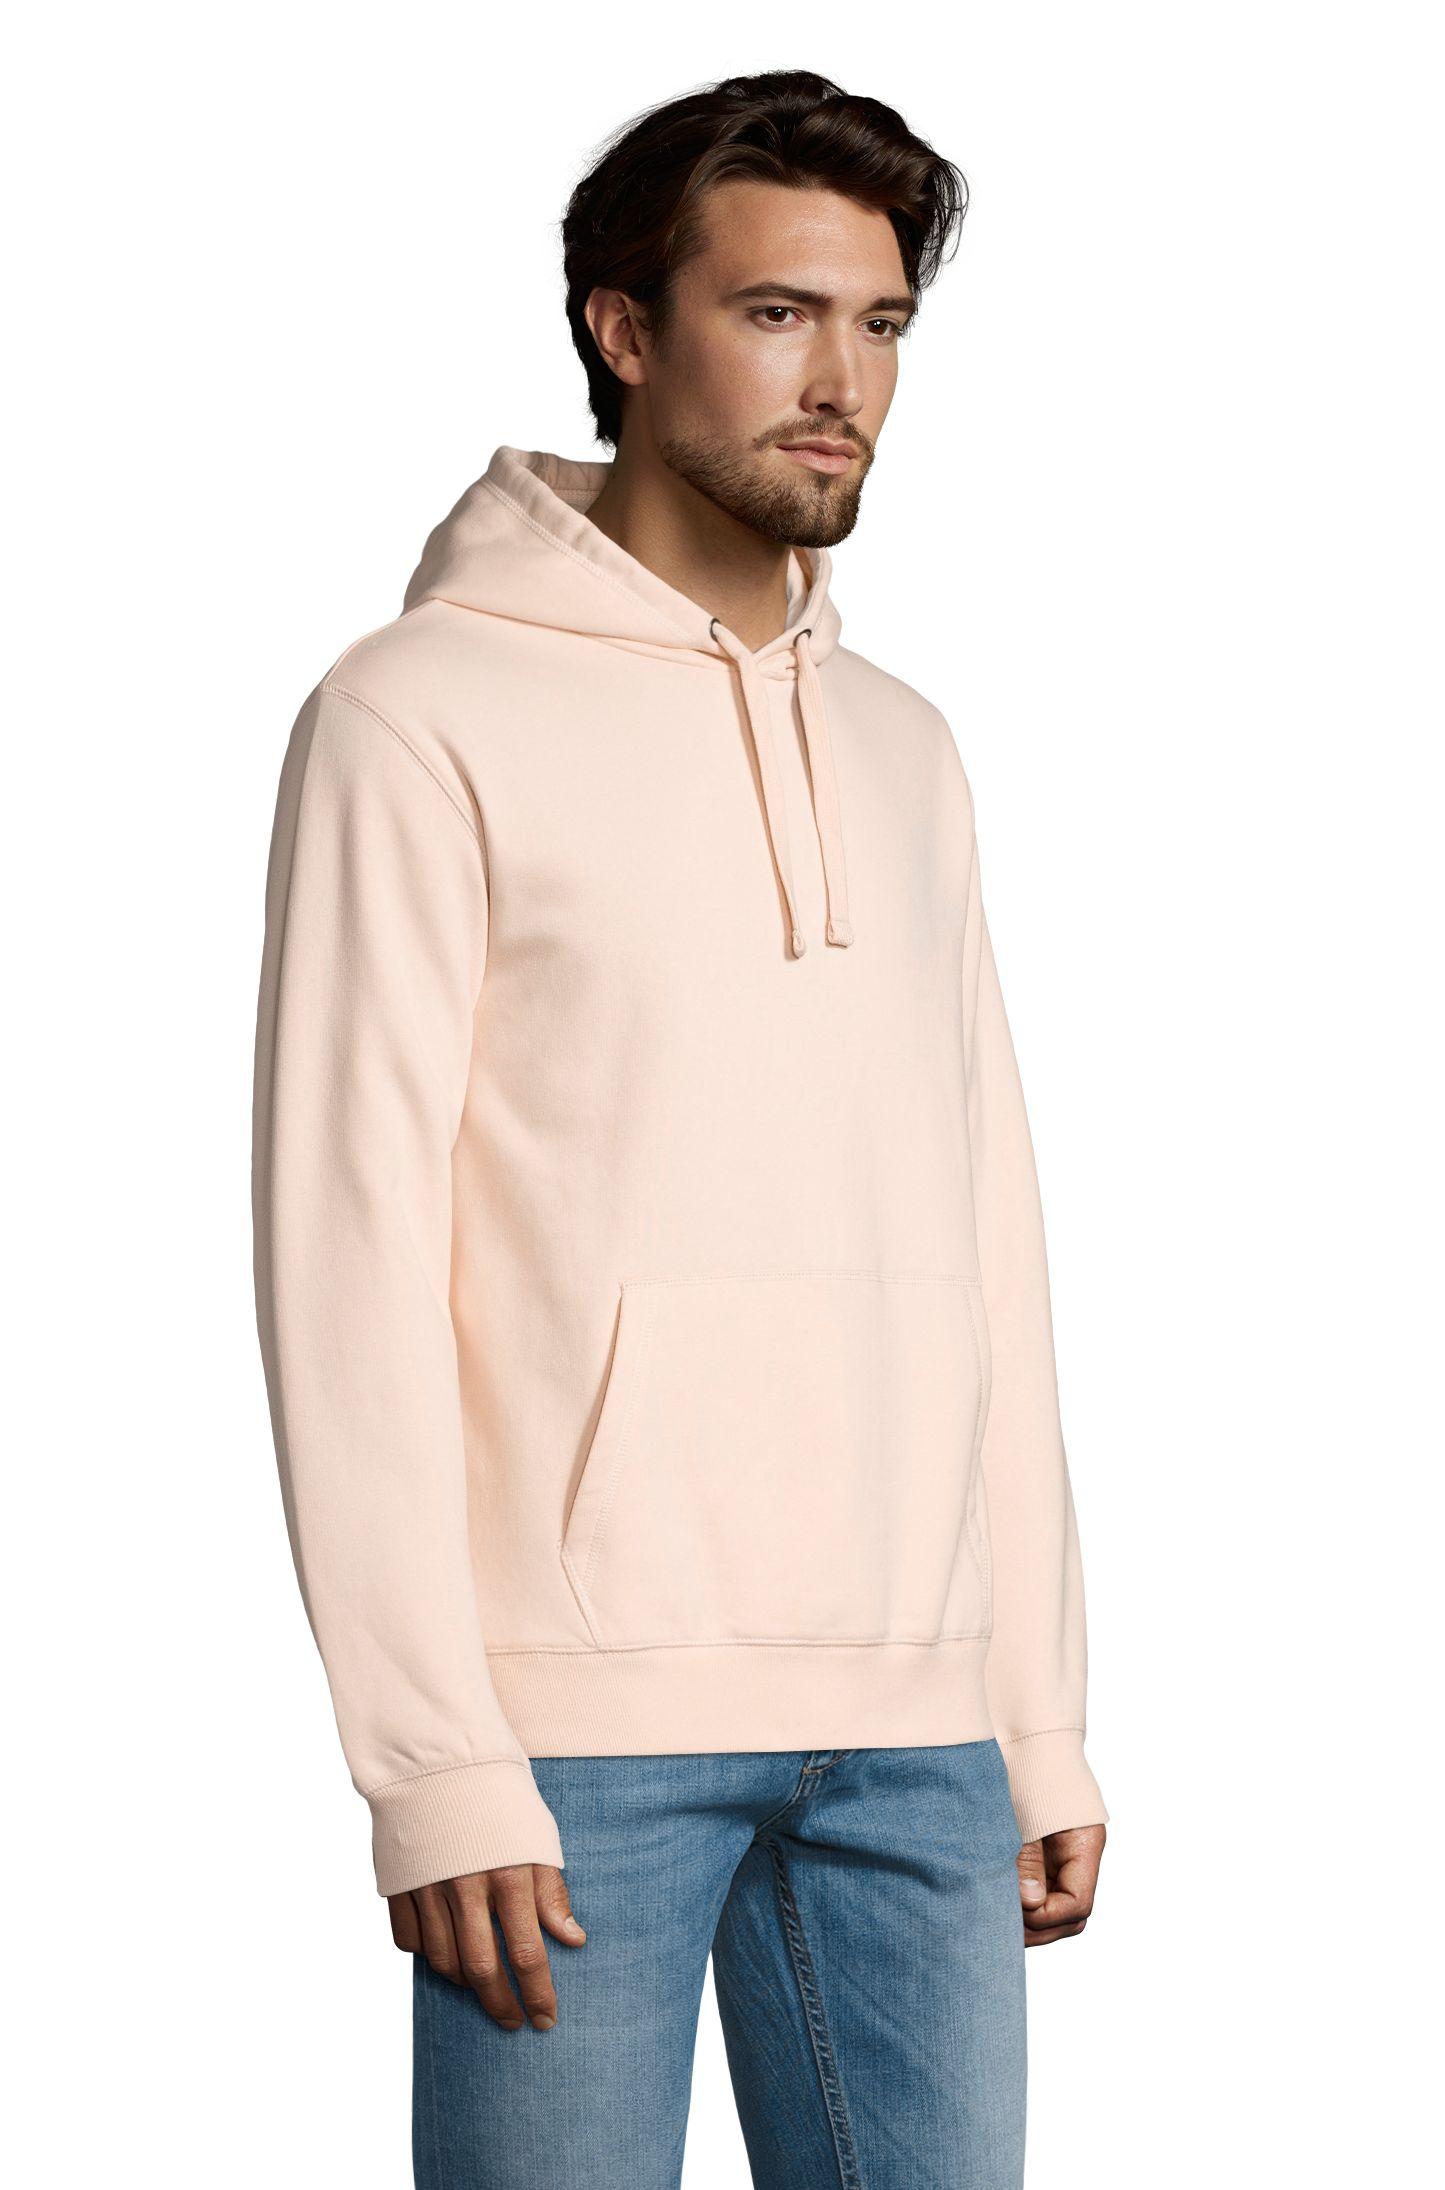 143 - Creamy pink